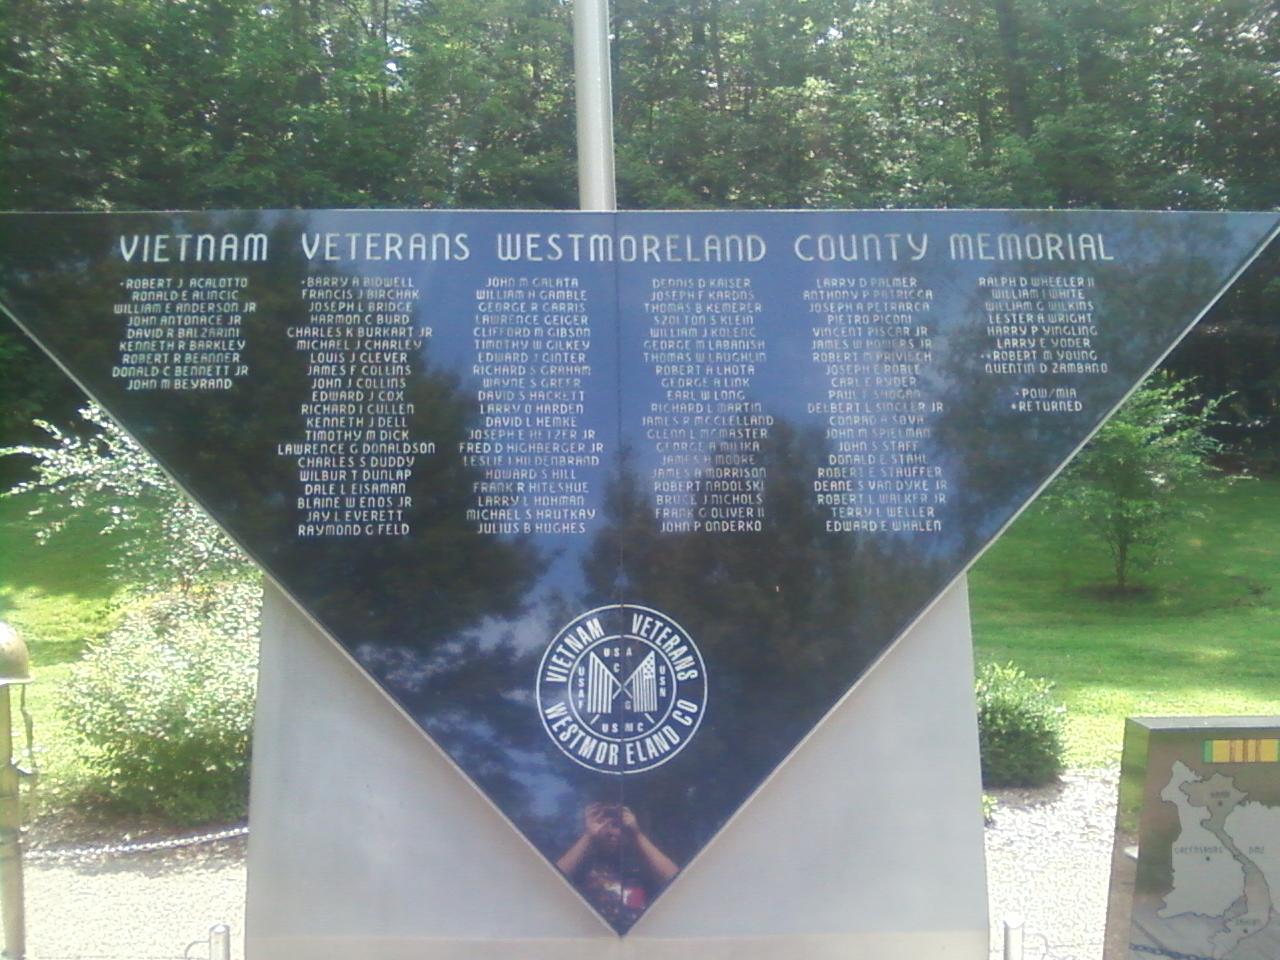 Vietnam War Memorial, Twin Lakes Park, Luxor, PA, USA